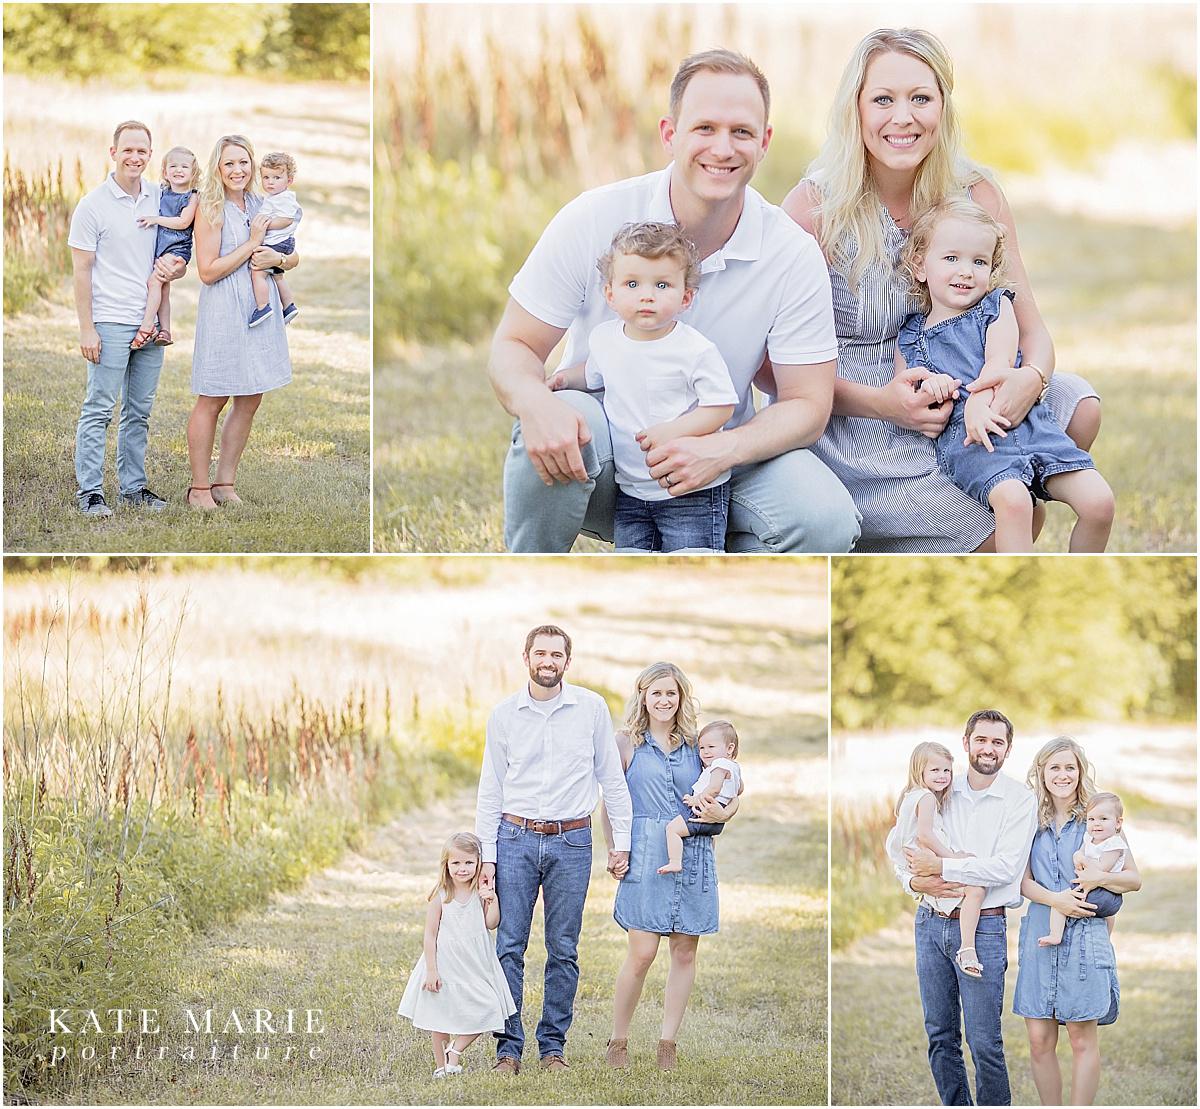 Miller-Dallas-family-photographer-flower-mound-child-photographer-katemarieportraiture-2.jpg